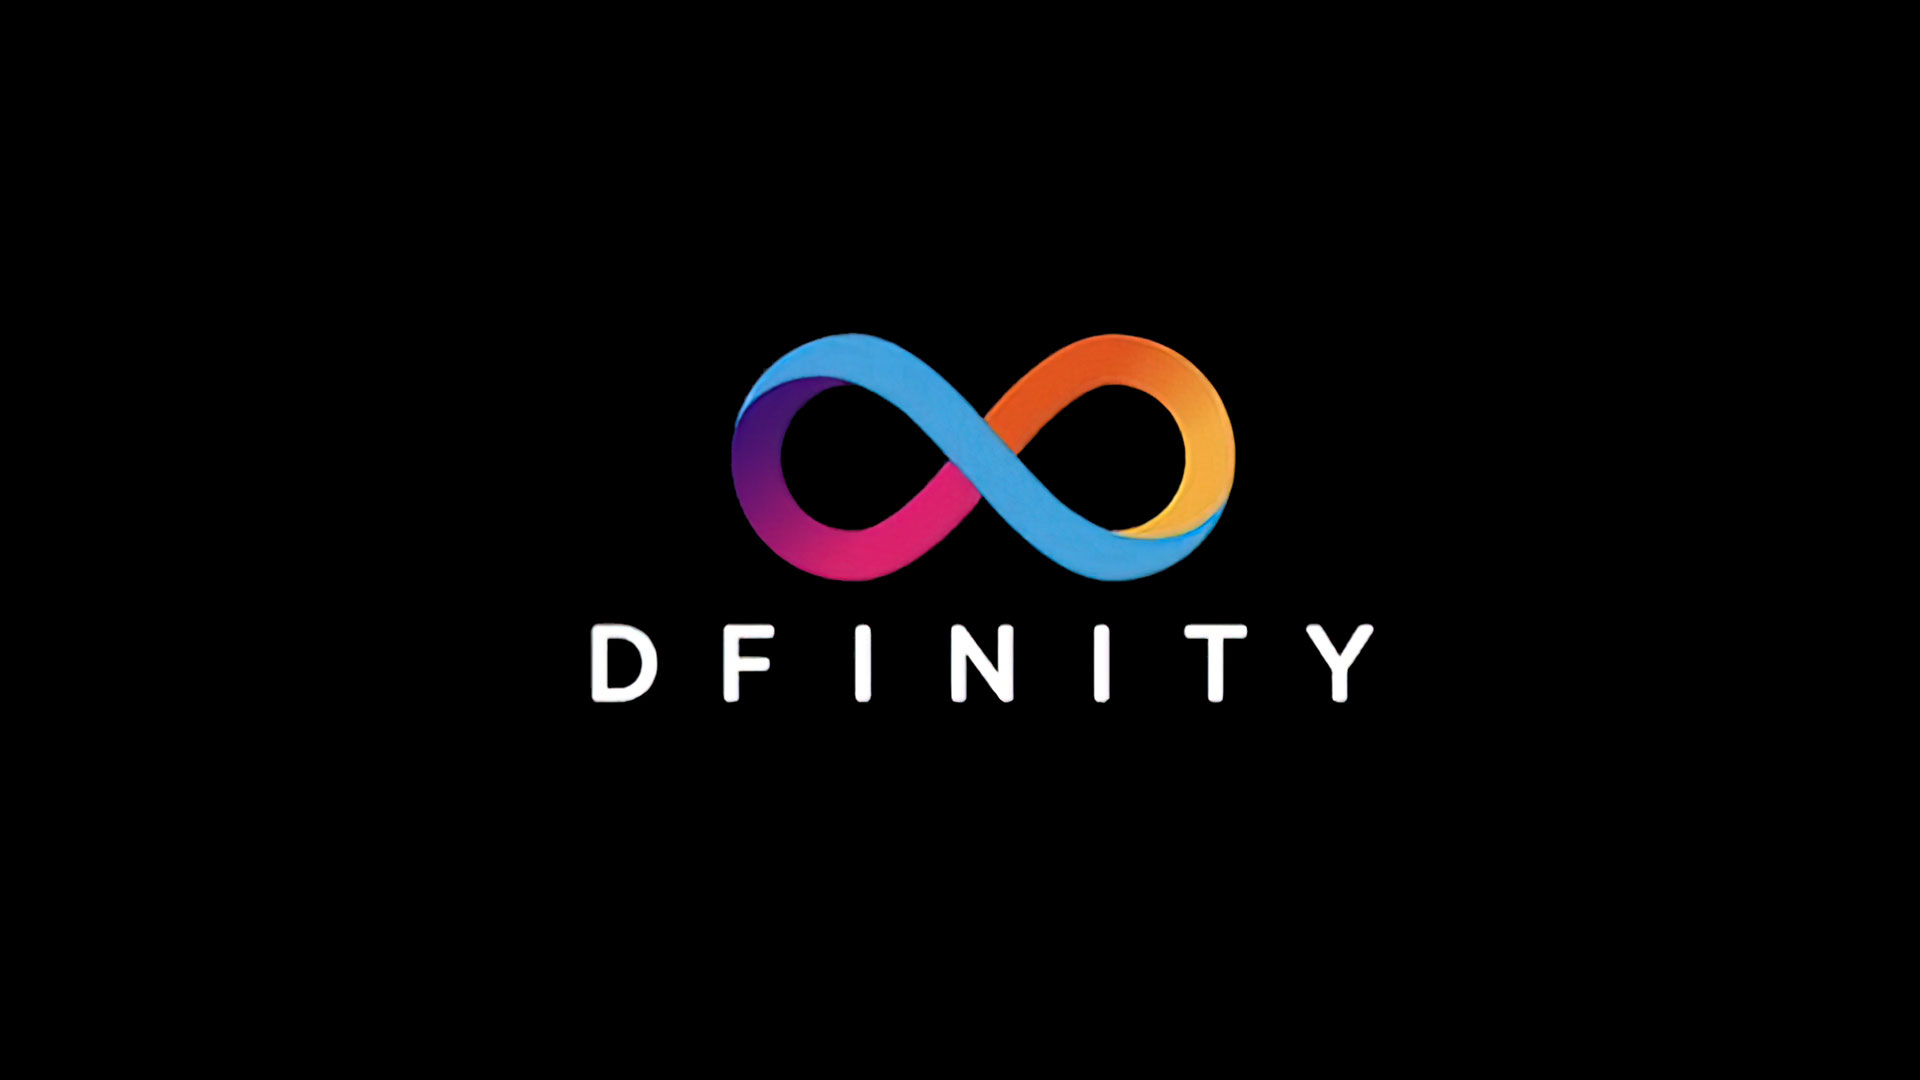 Токен популярного проекта Dfinity за полтора месяца обвалился на 95%